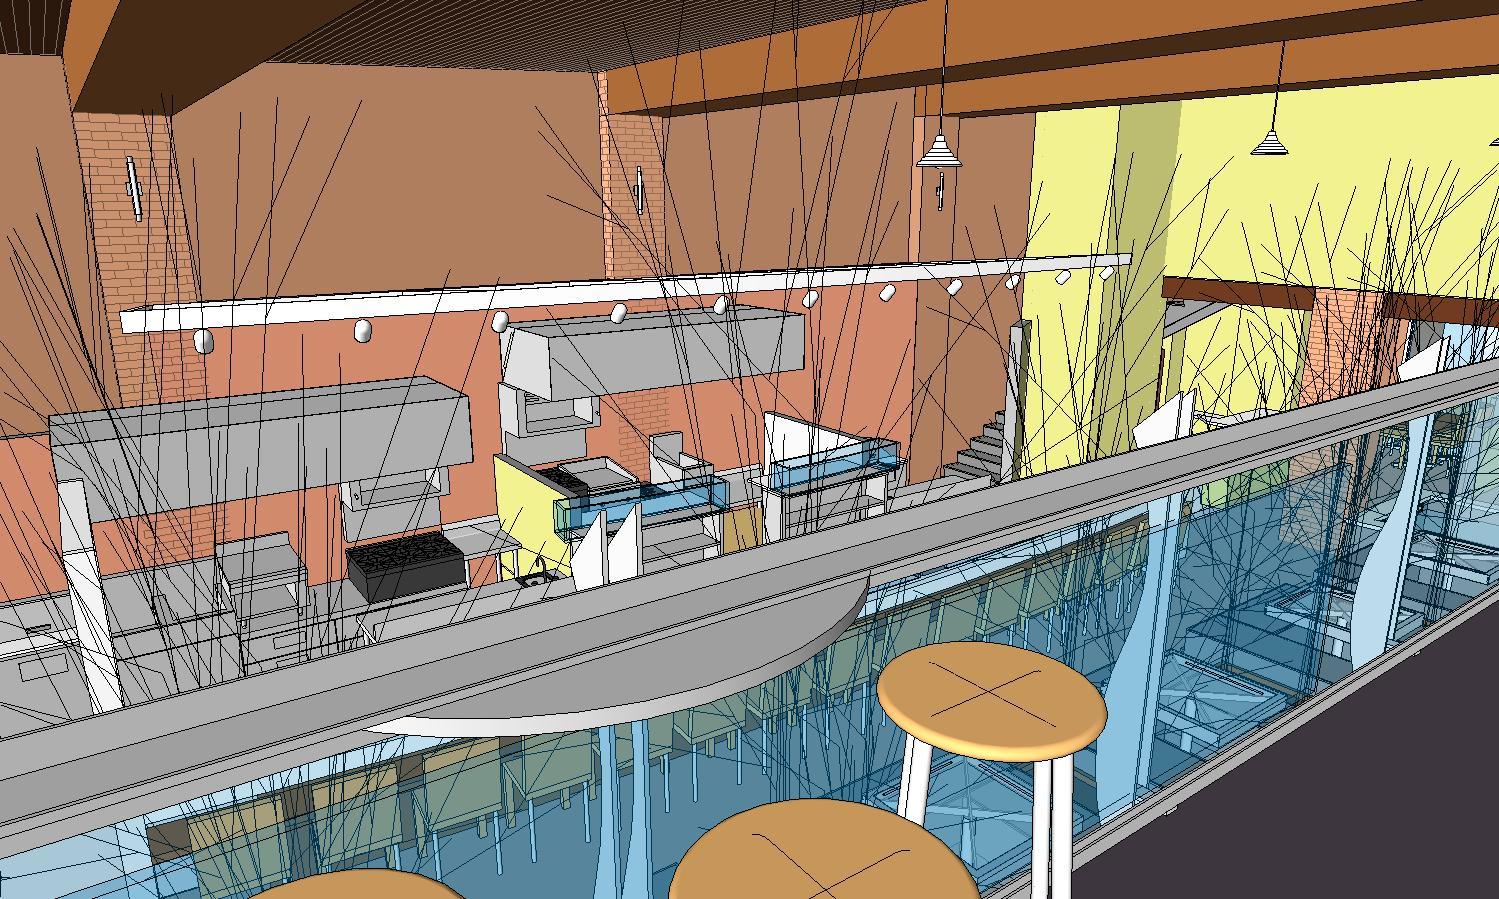 031211 - 3D View- 1-8 Floor - Stage.jpg